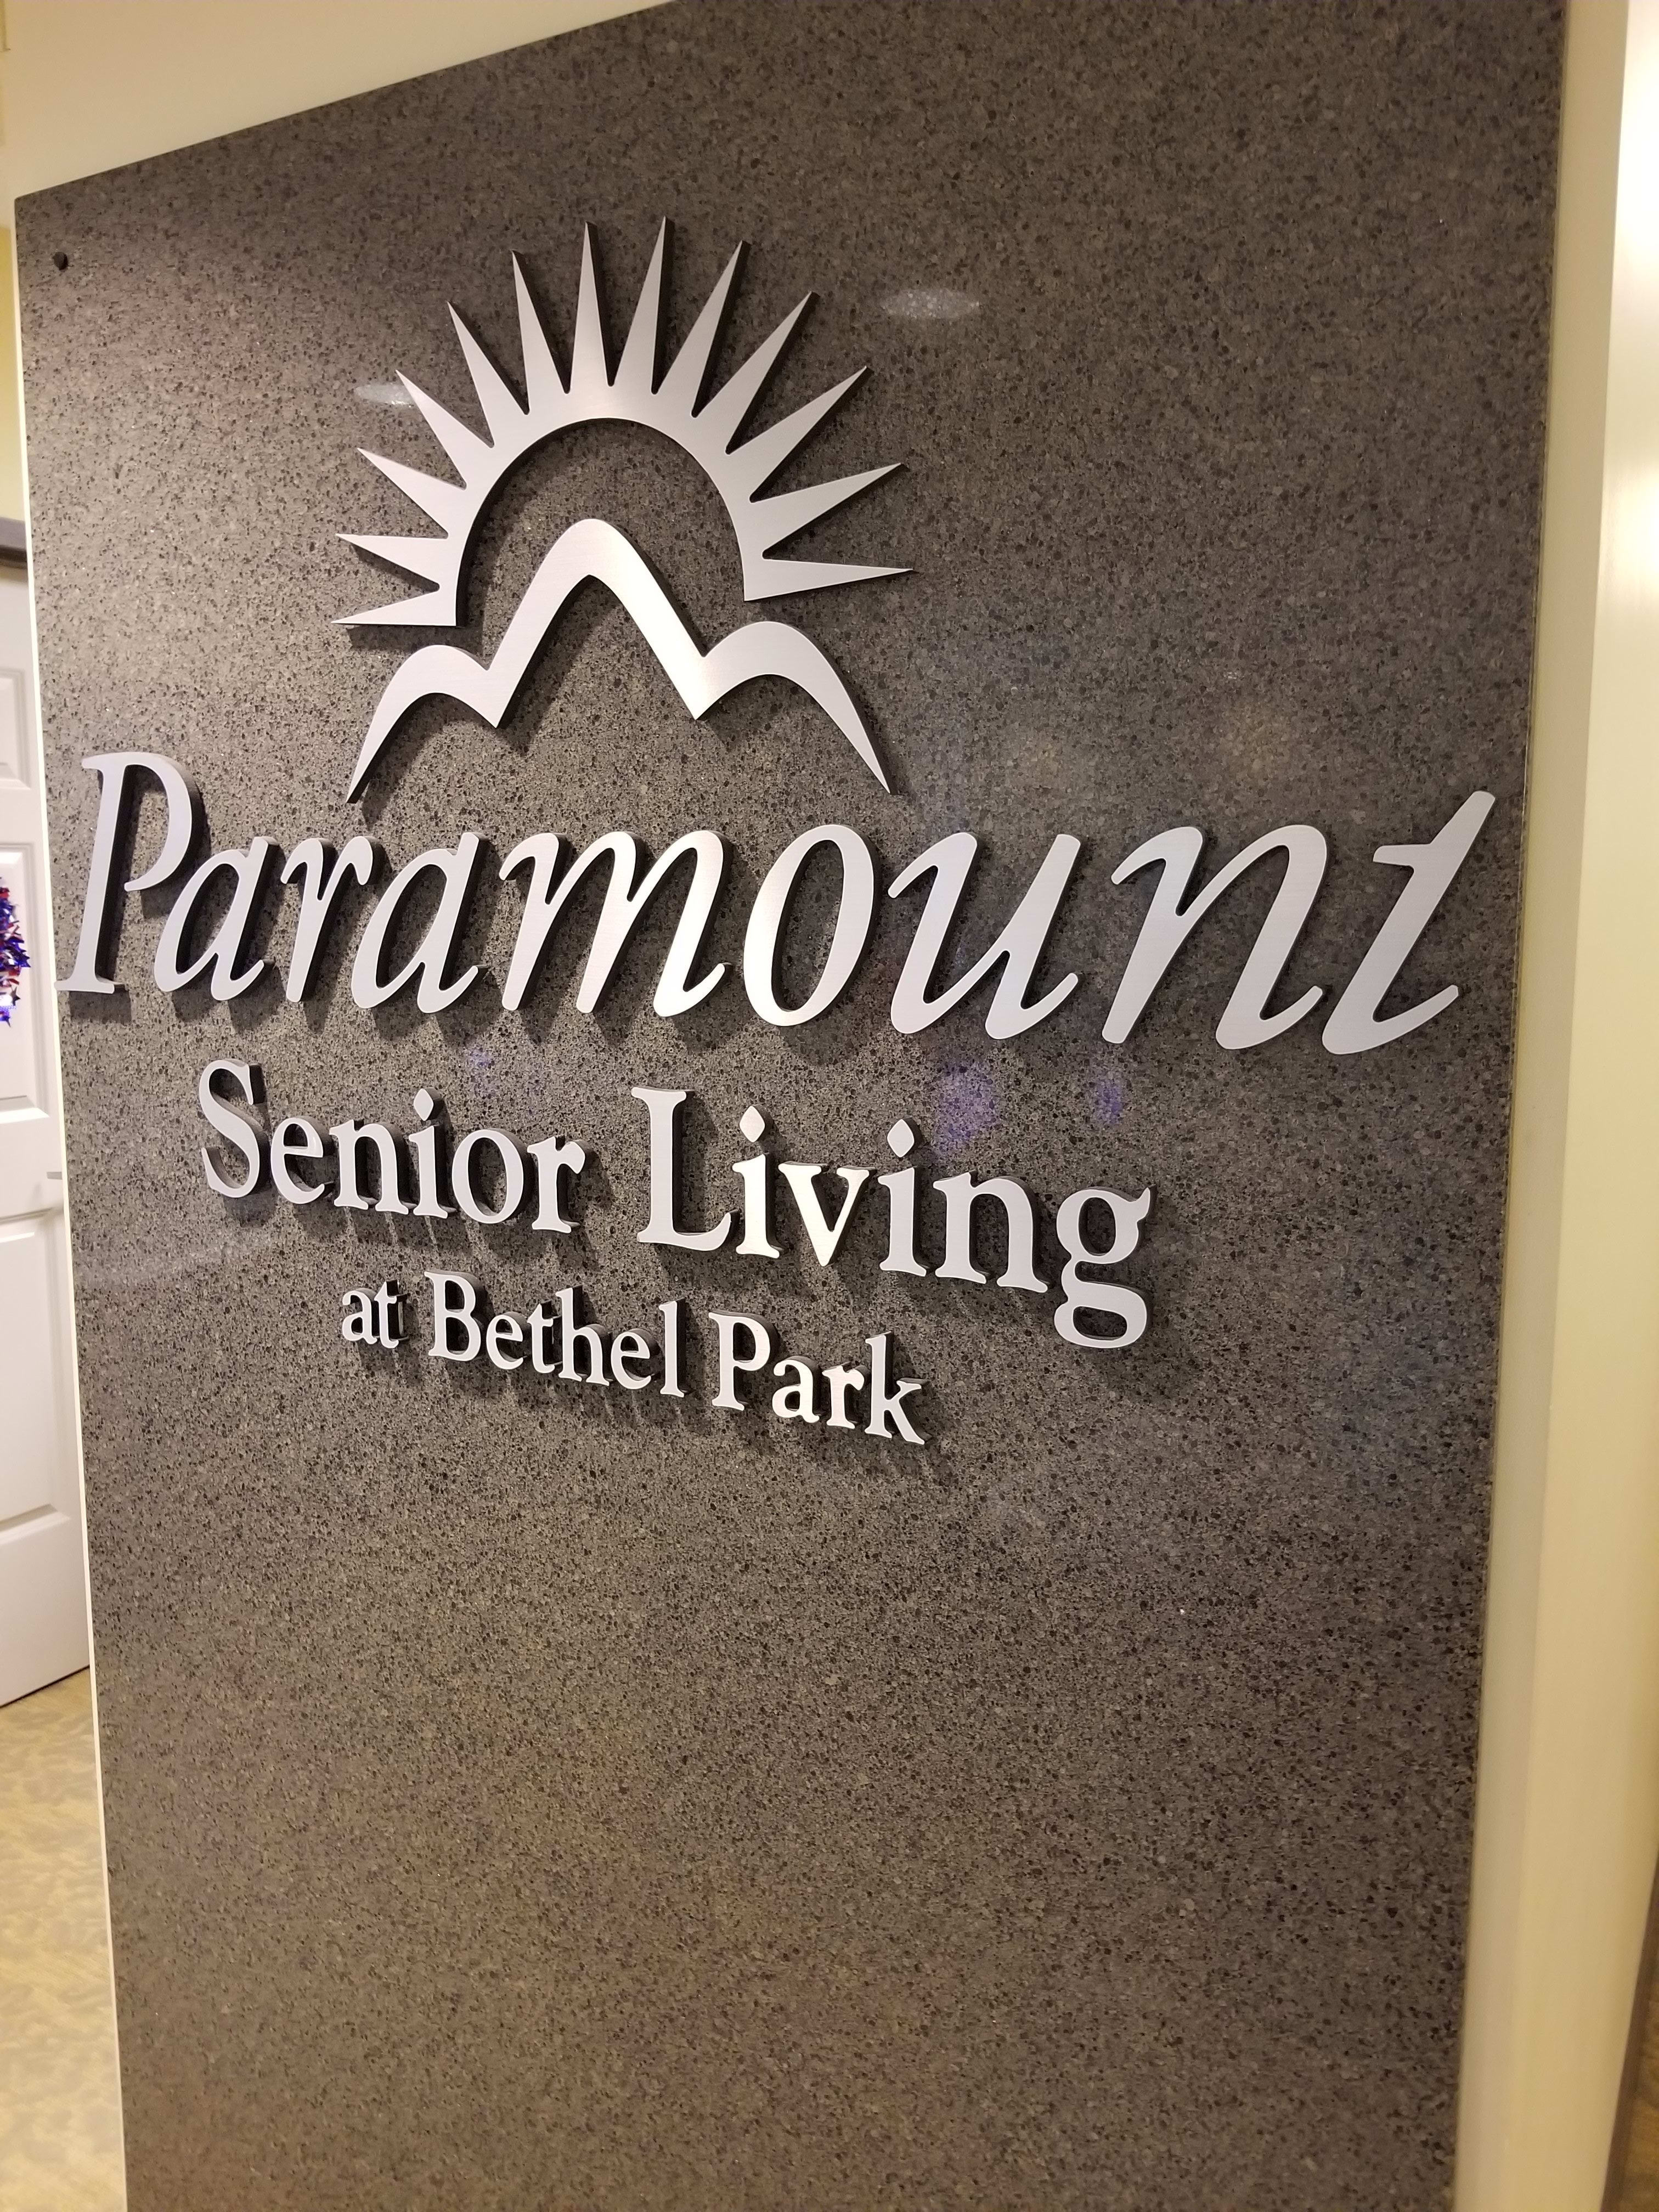 Photo 1 of Paramount Senior Living at Bethel Park